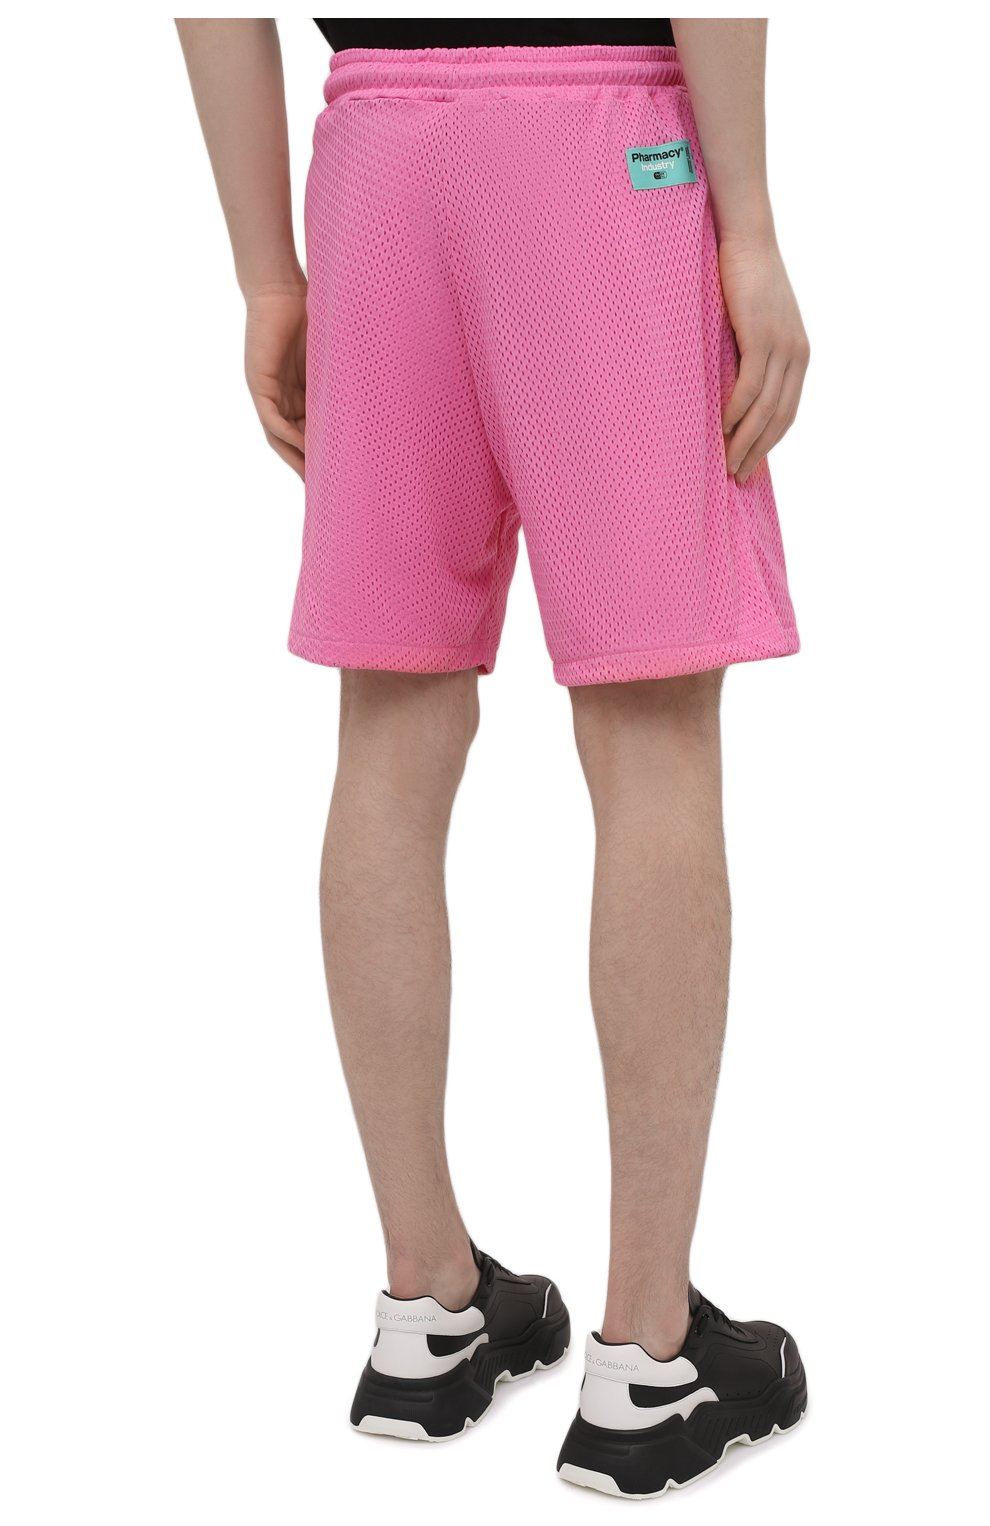 Мужские шорты PHARMACY INDUSTRY розового цвета, арт. PHM230 | Фото 4